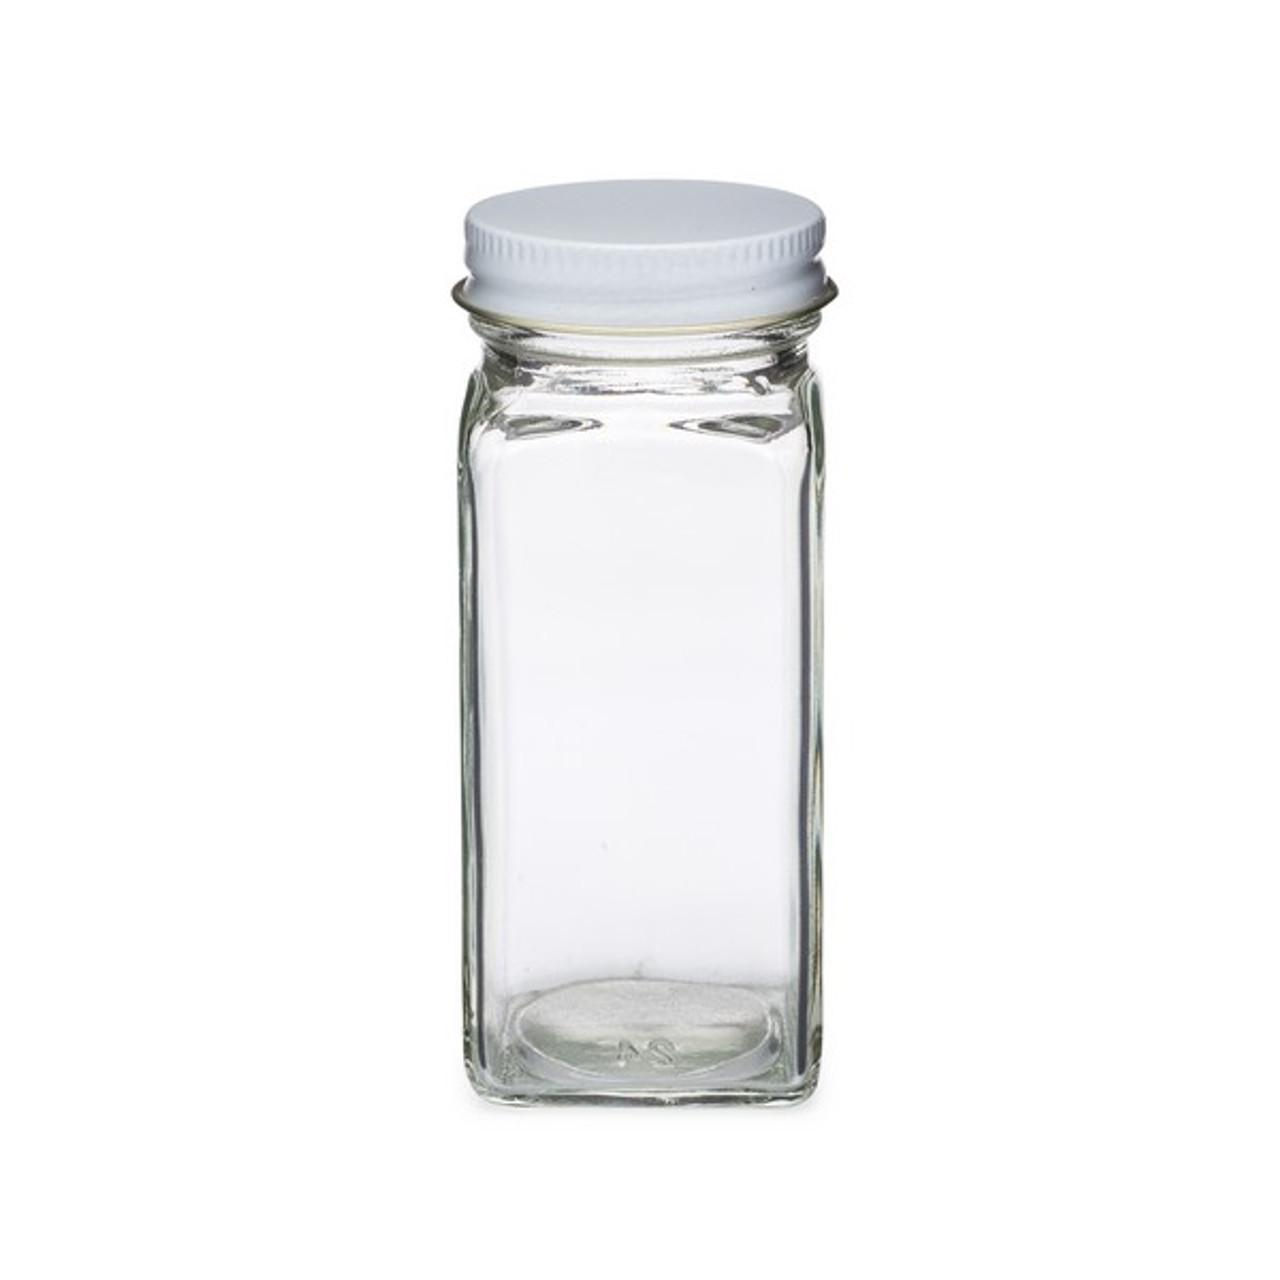 4 oz Clear Square Glass Spice Jars (White Metal Cap) - SP4SQW-METAL